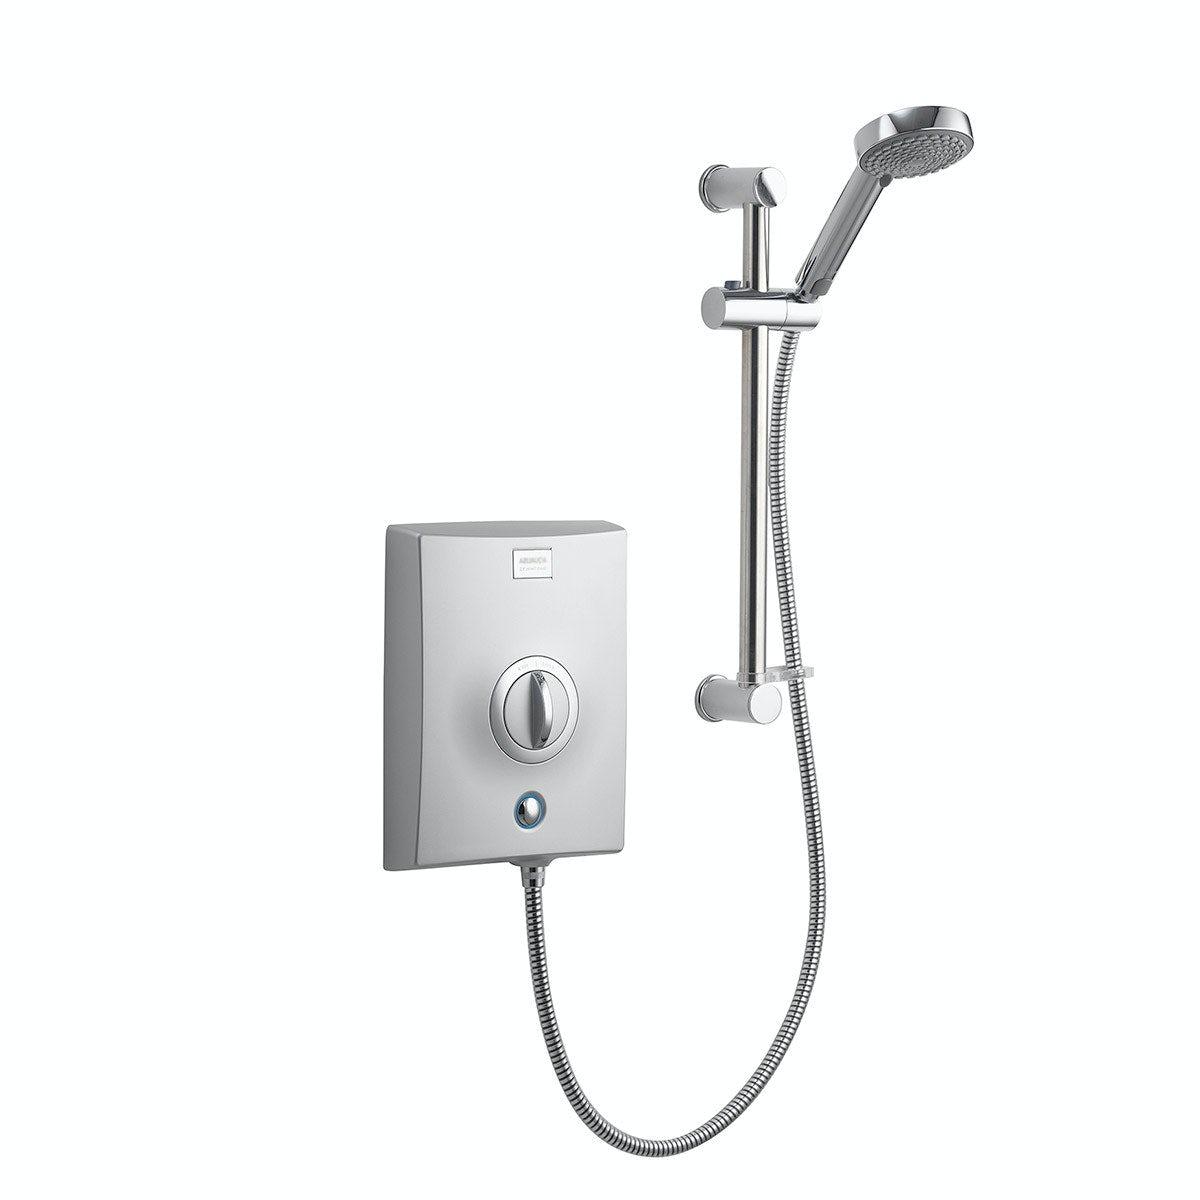 Aqualisa quartz electric shower 9.5kw - Sold by Victoria Plum